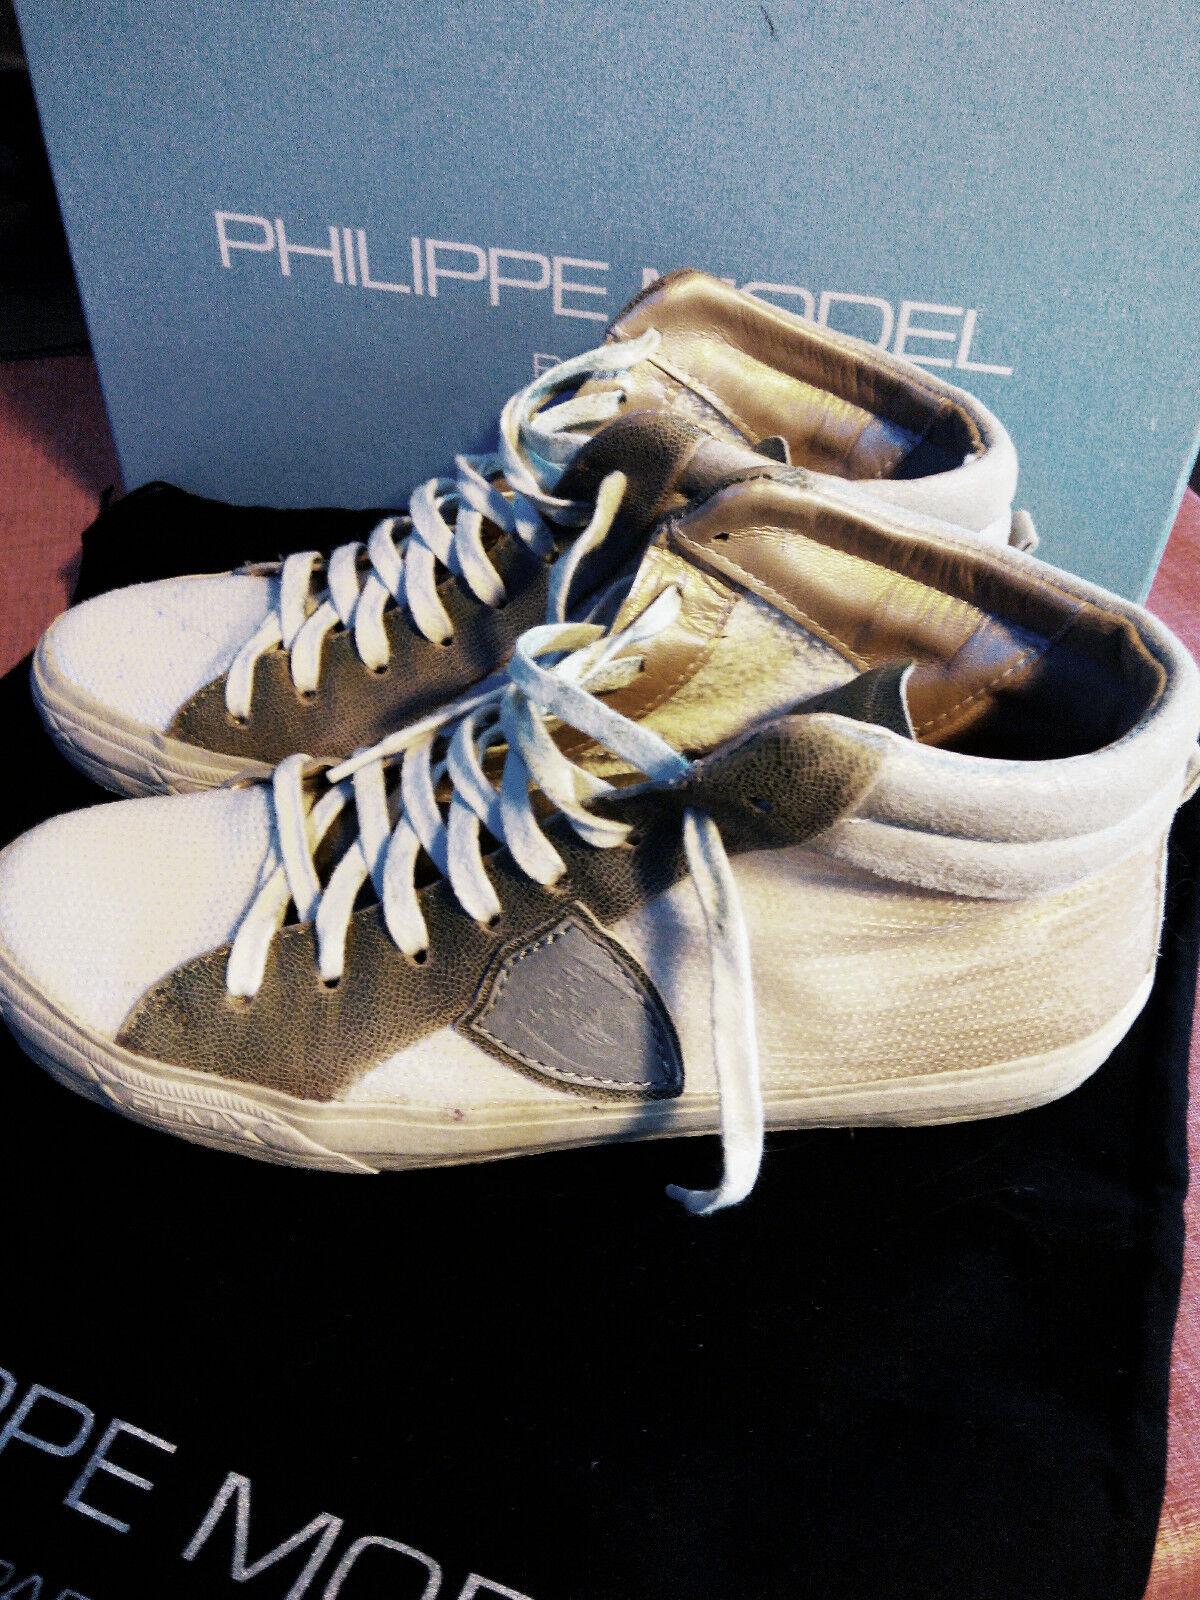 Philippe Model Damen Sneaker Beige 37 37 Beige d30c6c